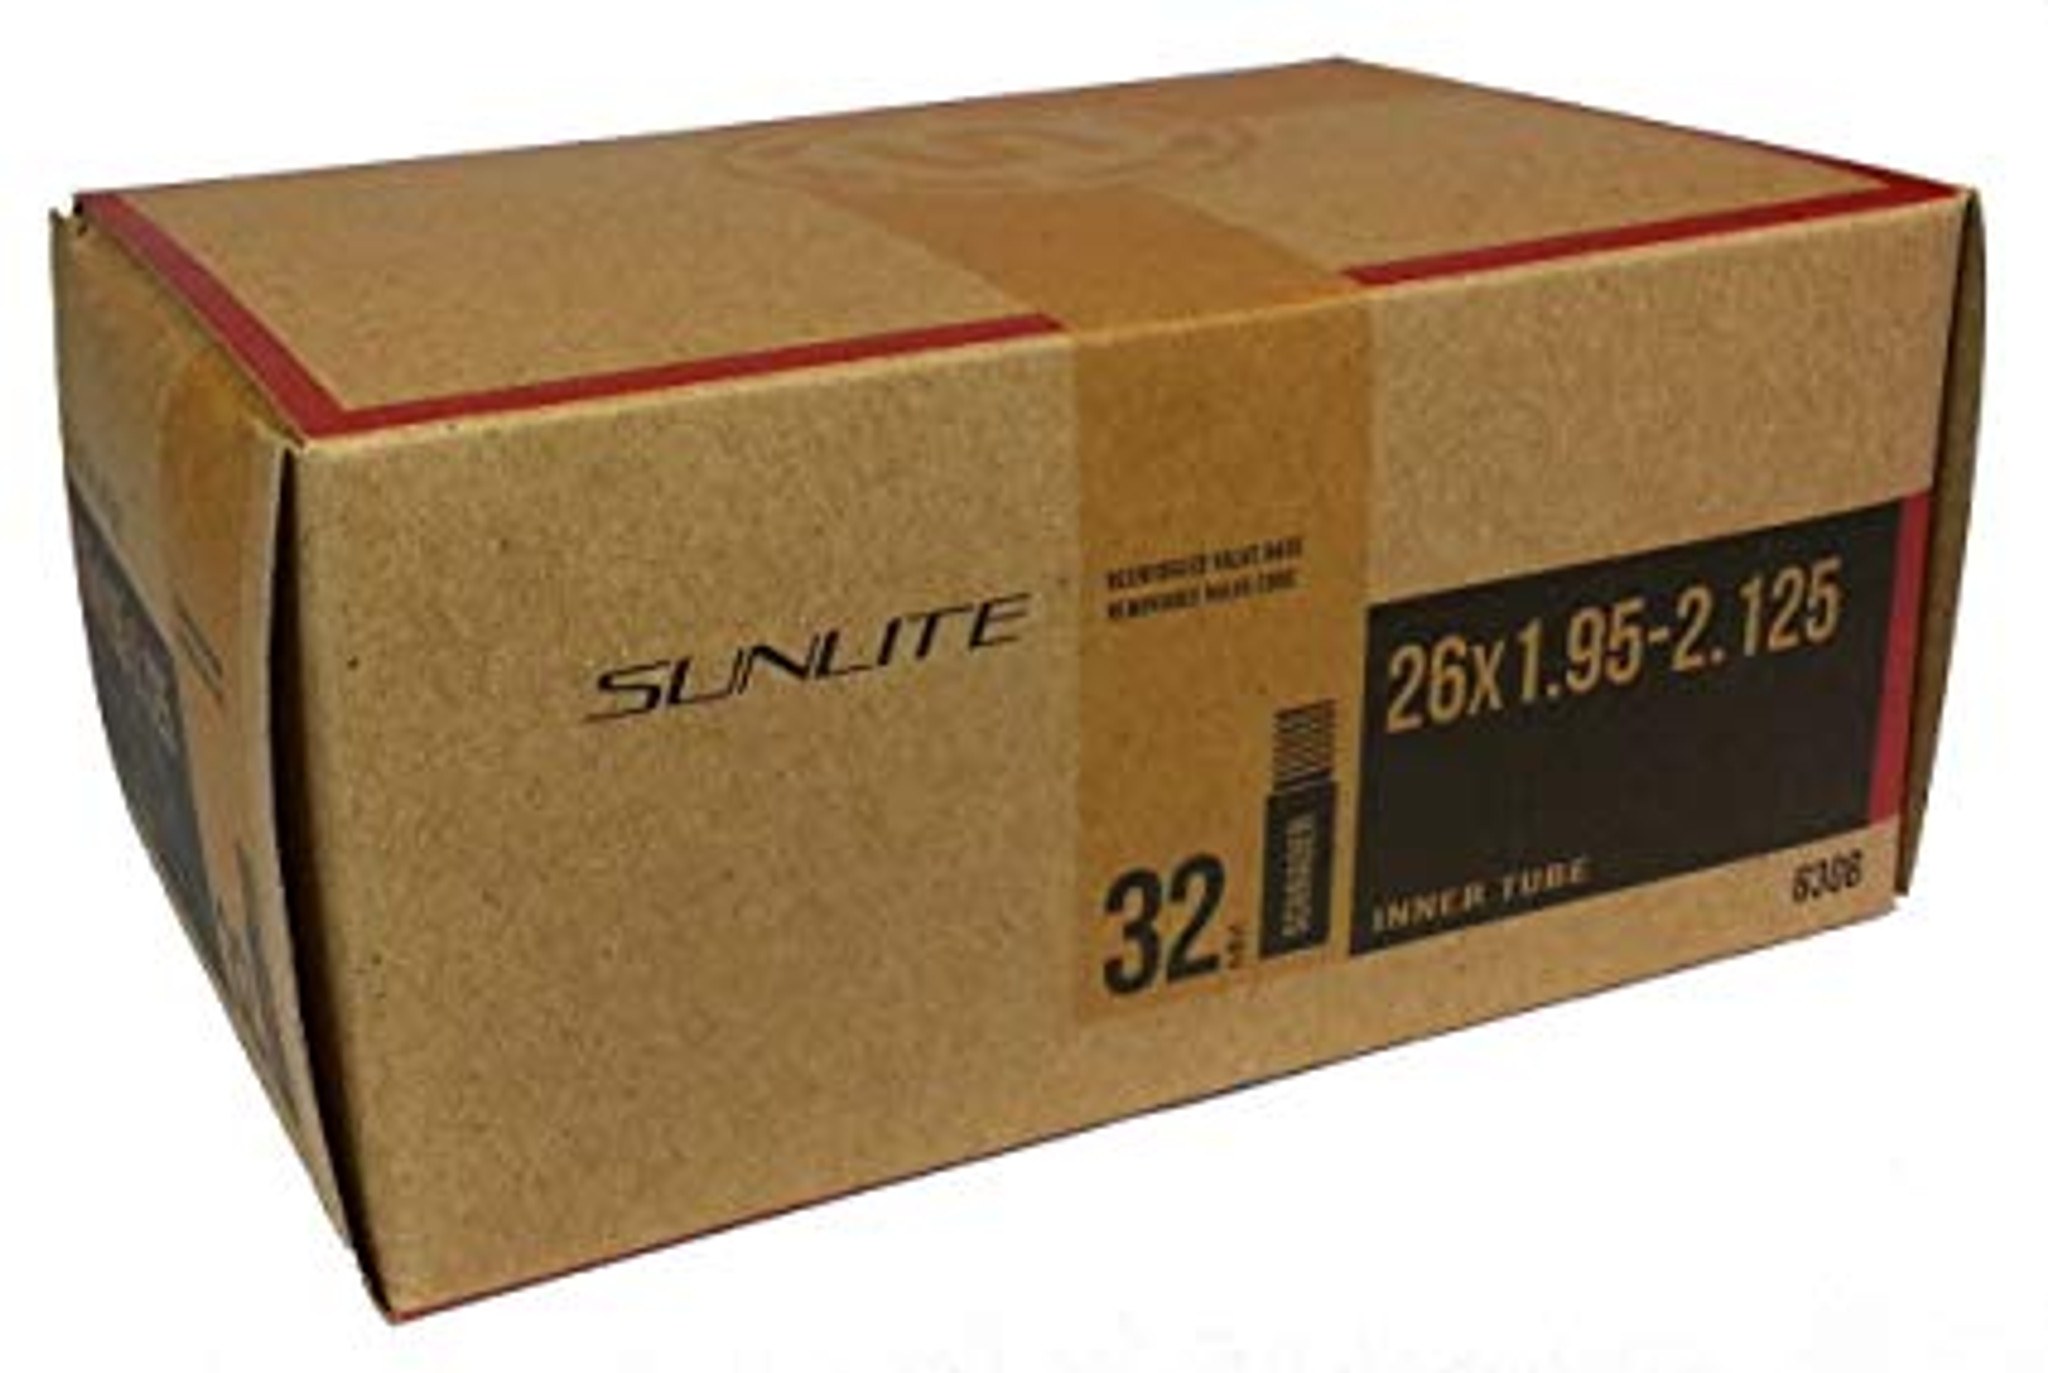 "Bicycle Inner Tube 26/"" x 1.95-2.125 Schrader Valve 32mm"